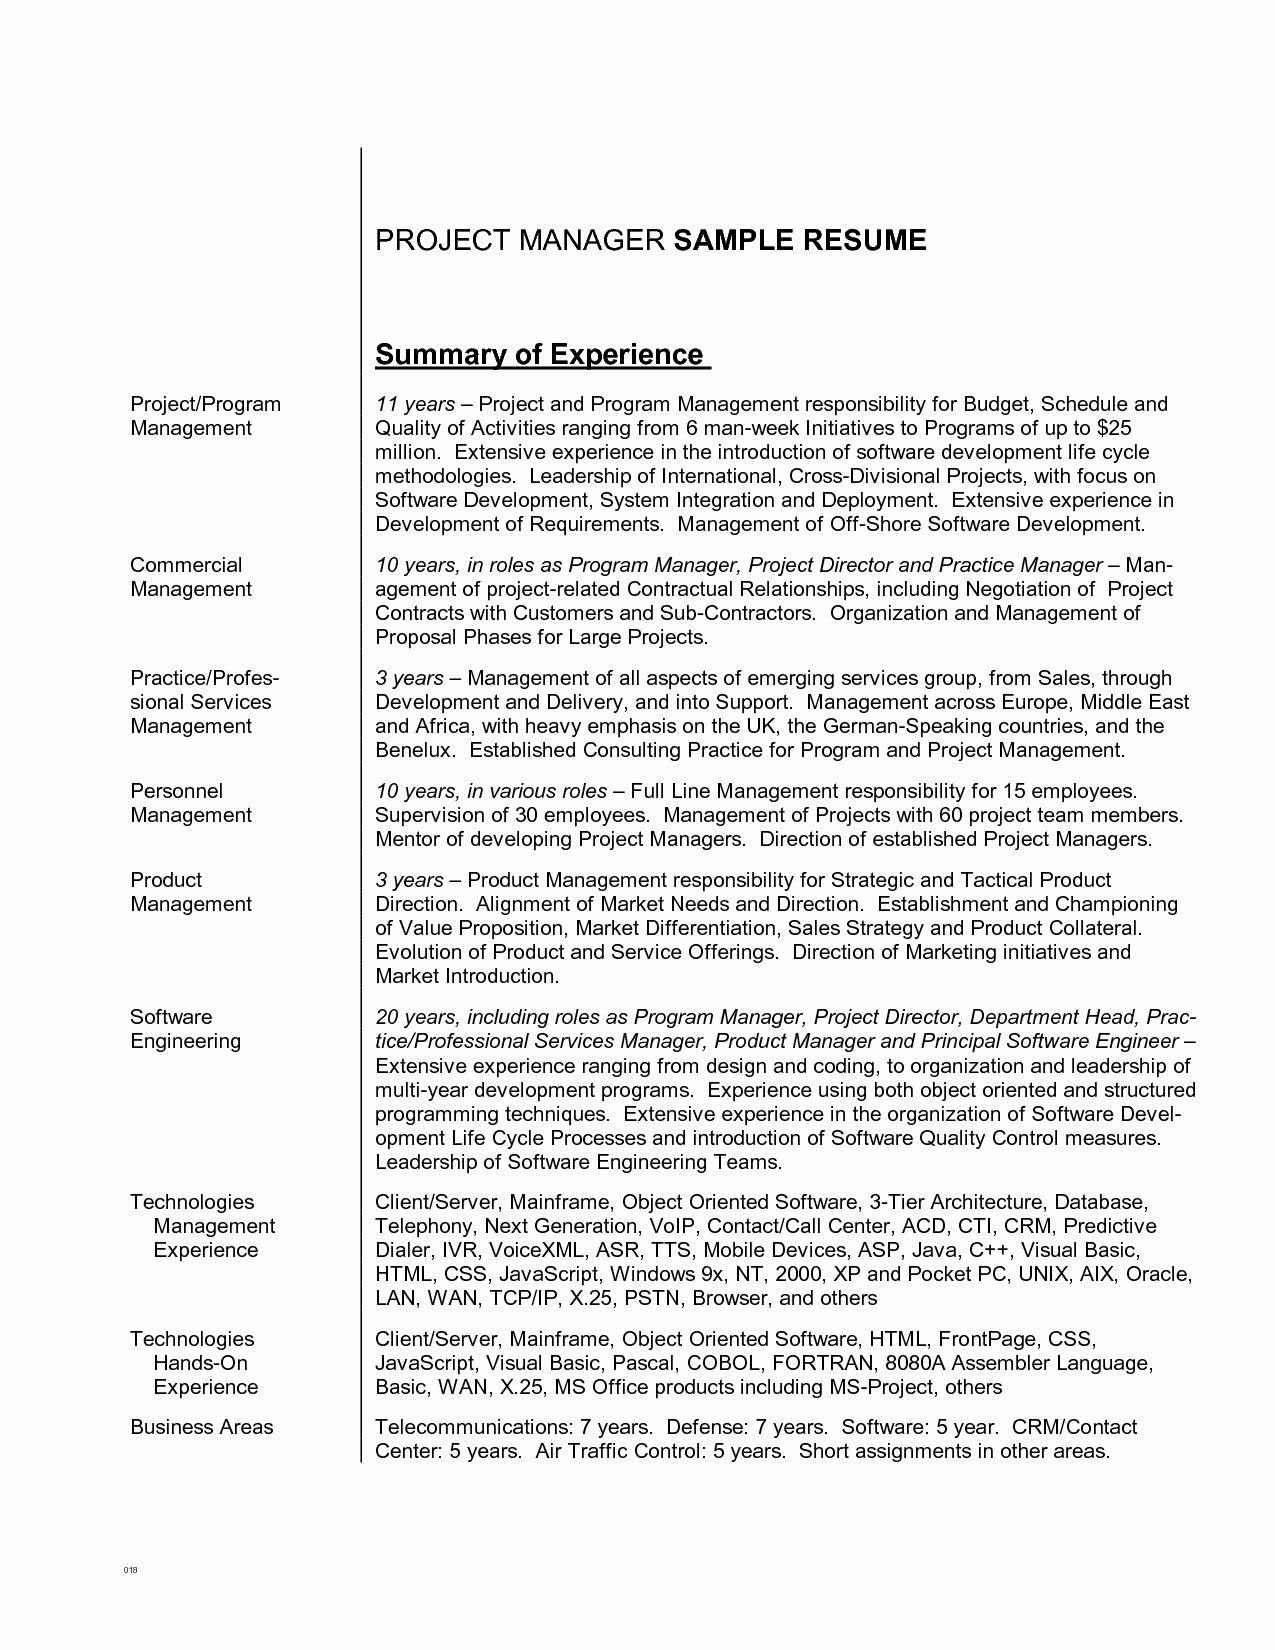 Resume General Summary Examples Resume Career Summary